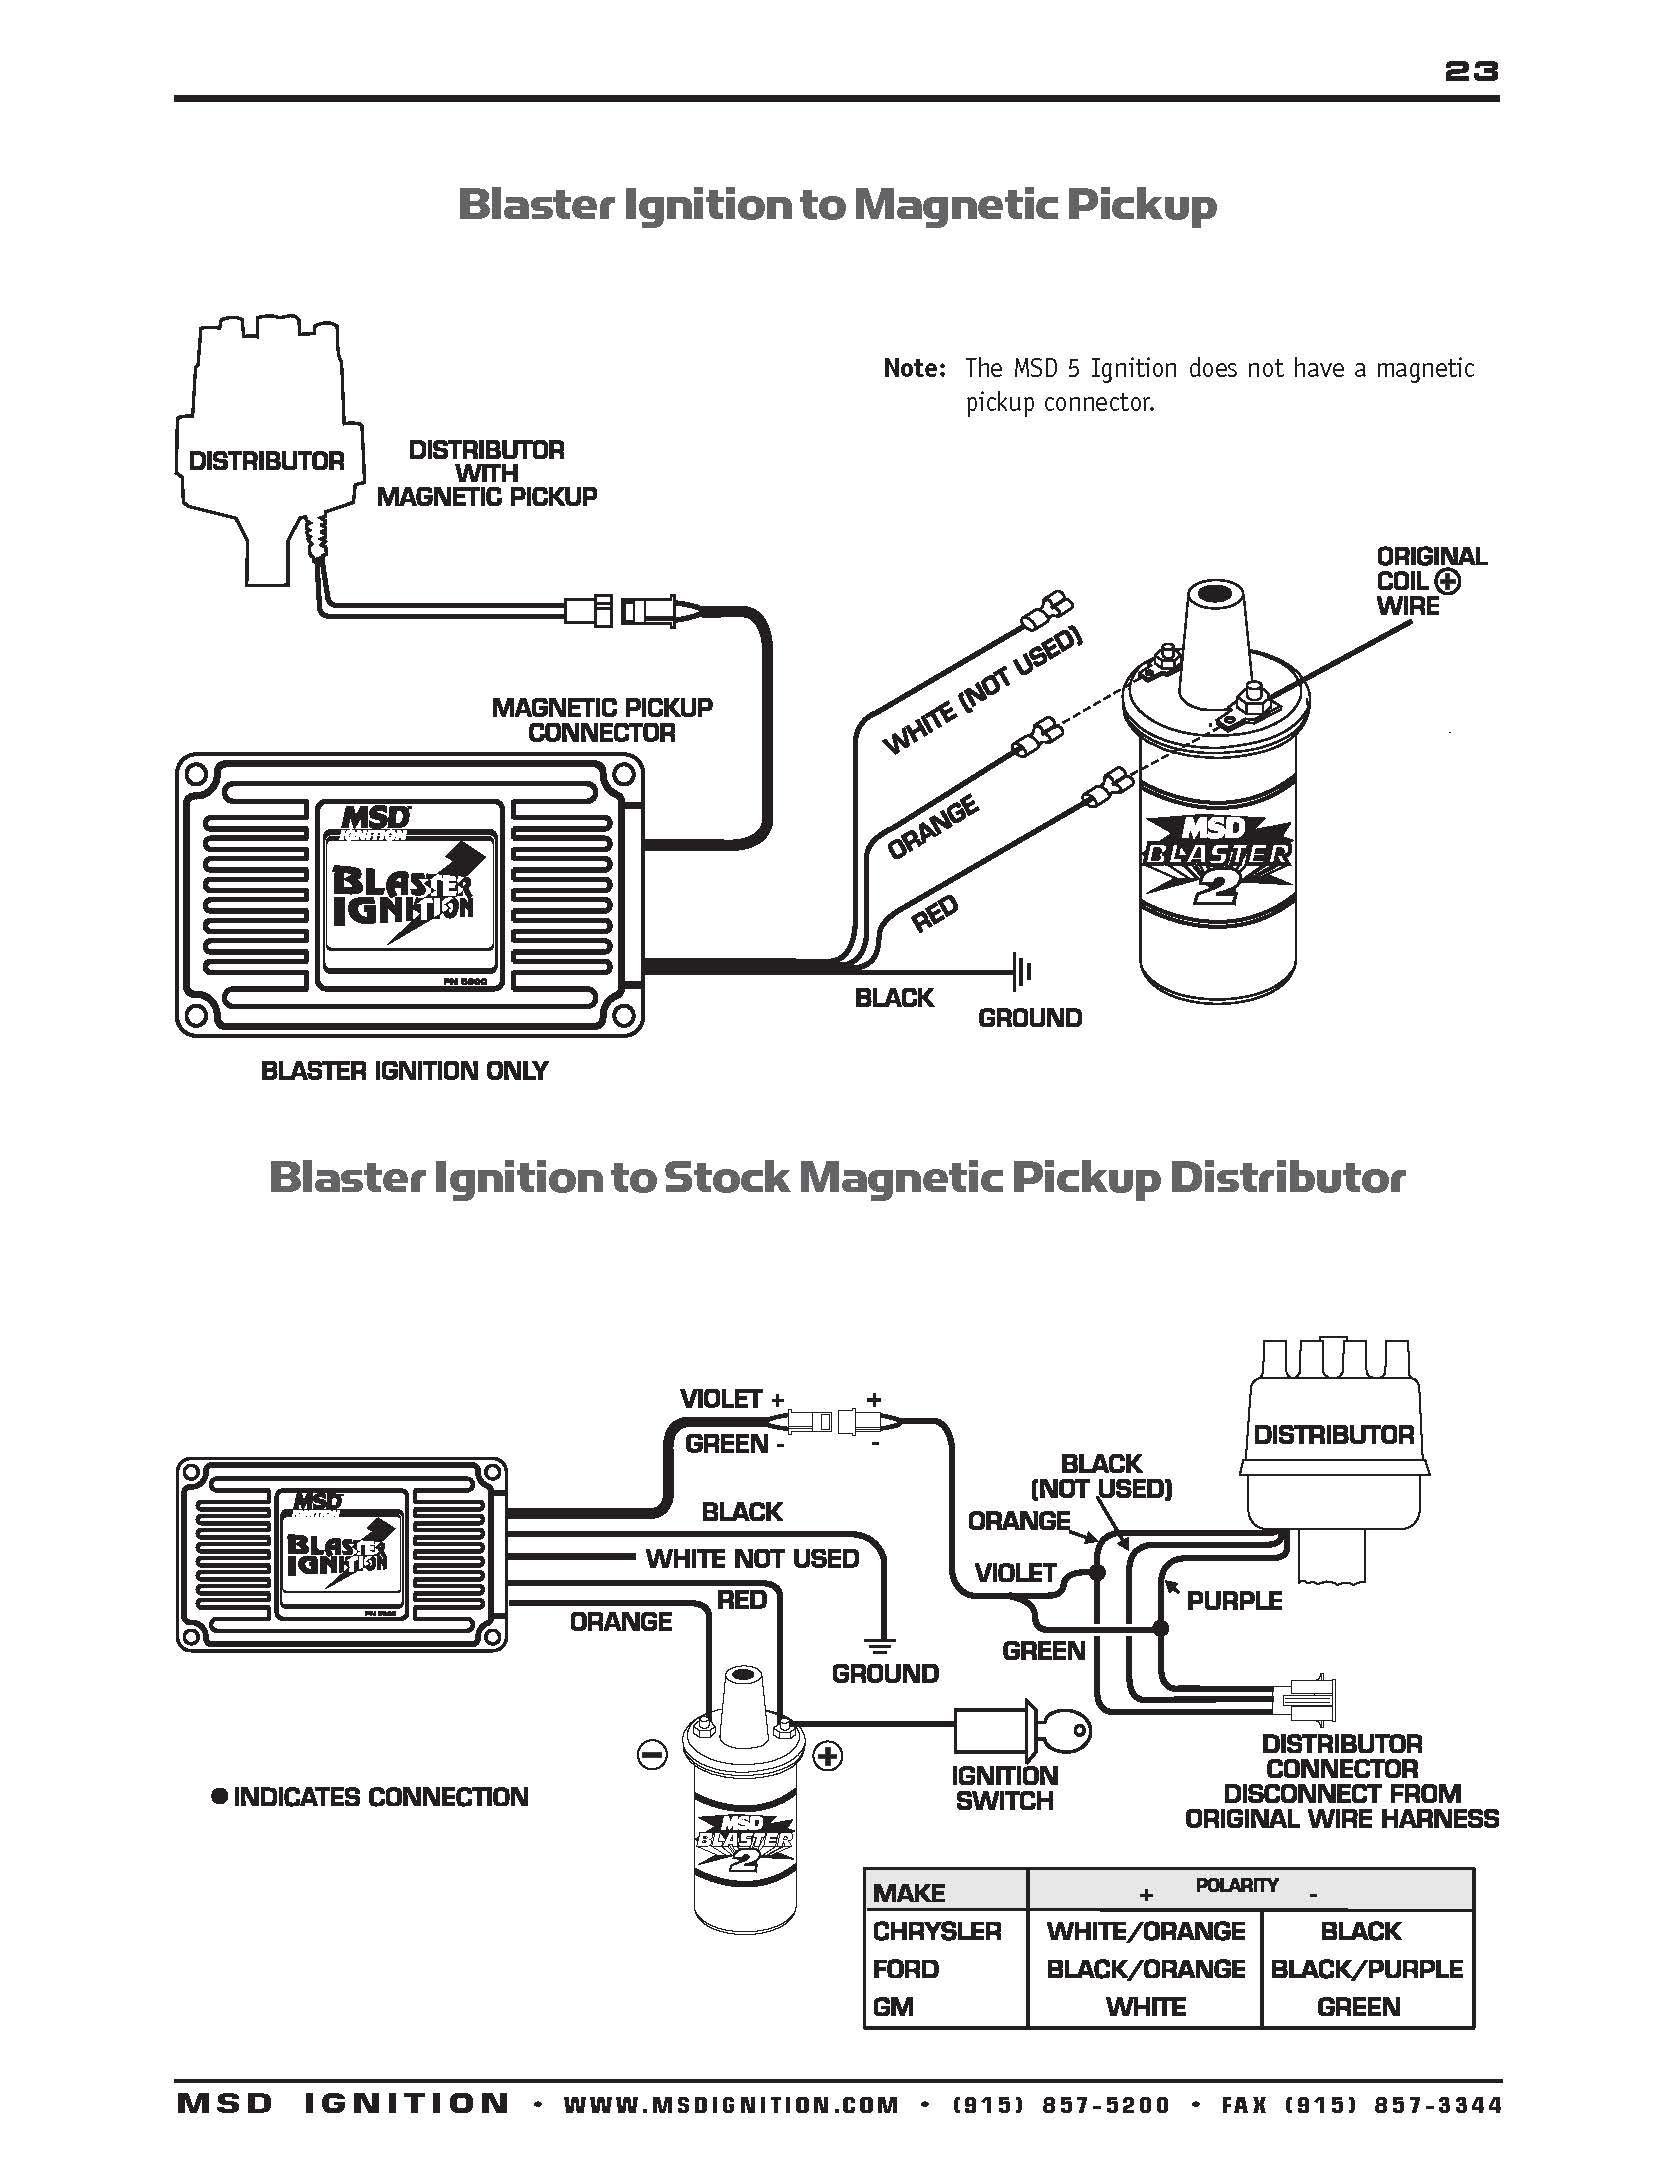 356 Tach Wiring | Wiring Diagram - Dodge Ignition Wiring Diagram